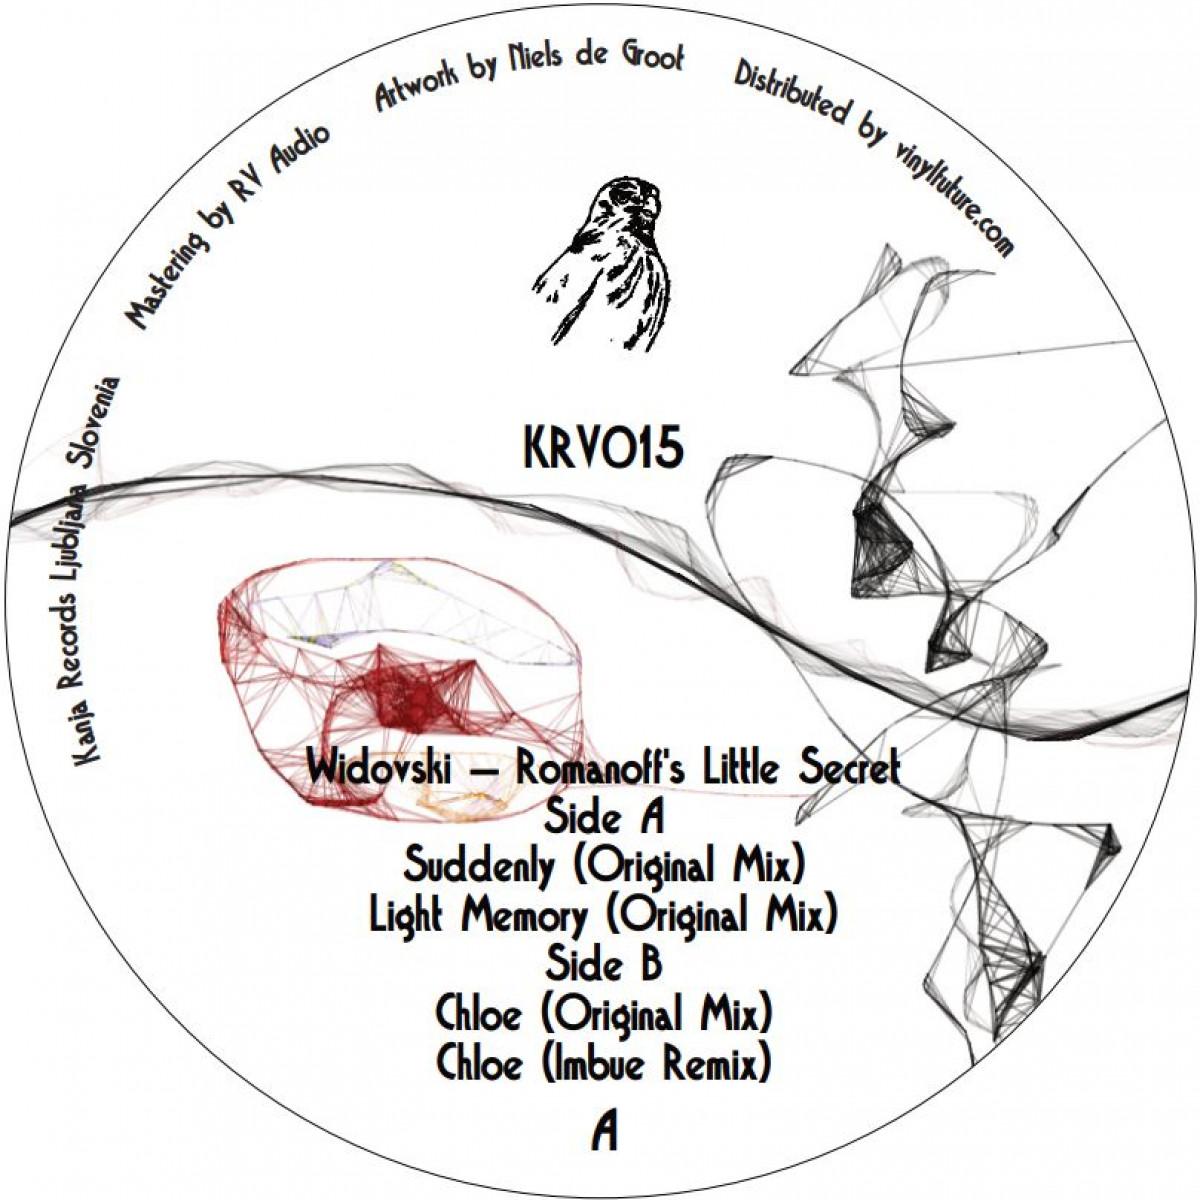 Widovski - Romanoffs Little Secret [Kanja Records] 02